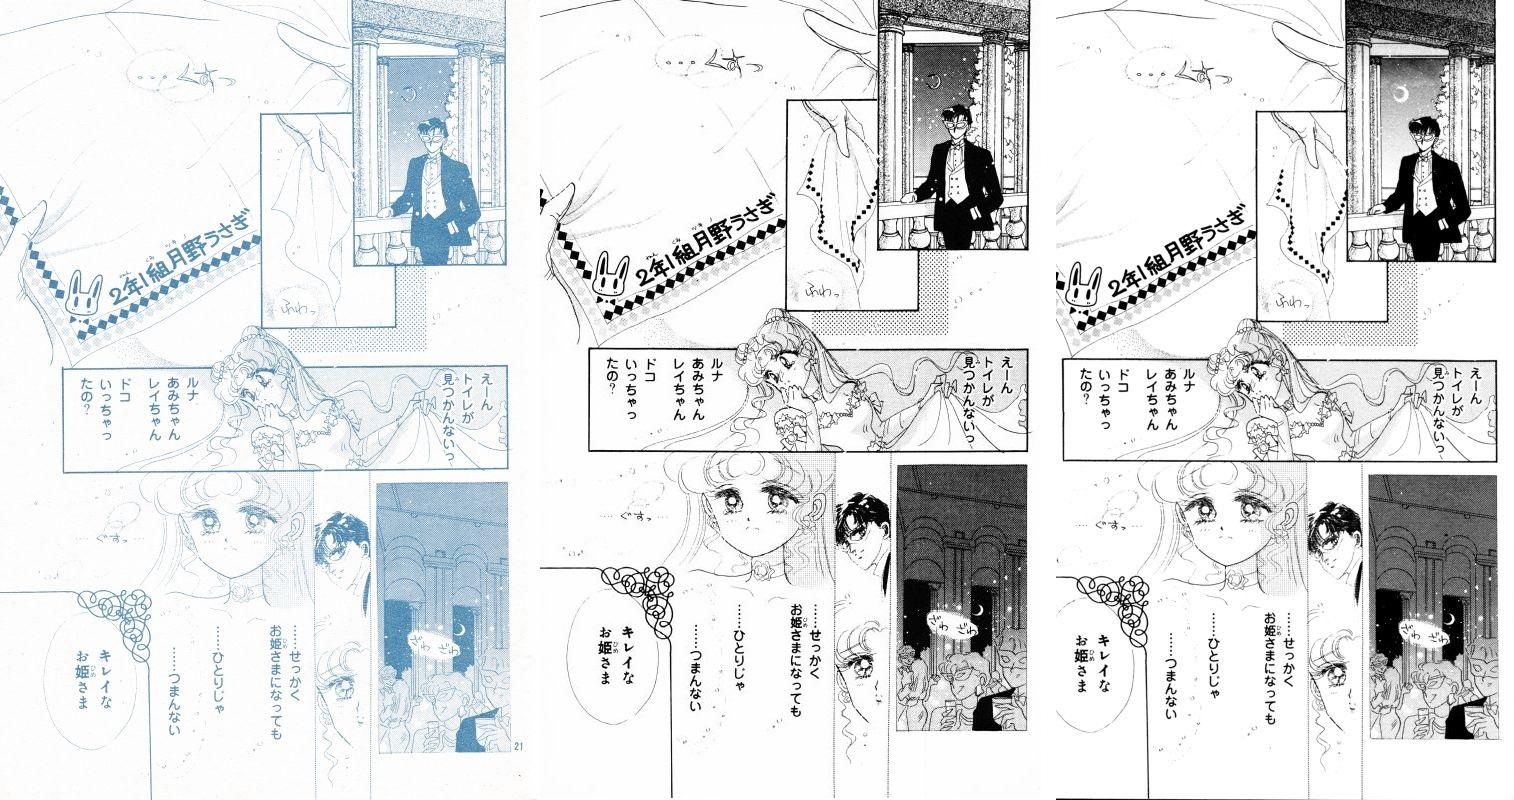 Act 4, Page 18 – Nakayoshi, Original, Remaster